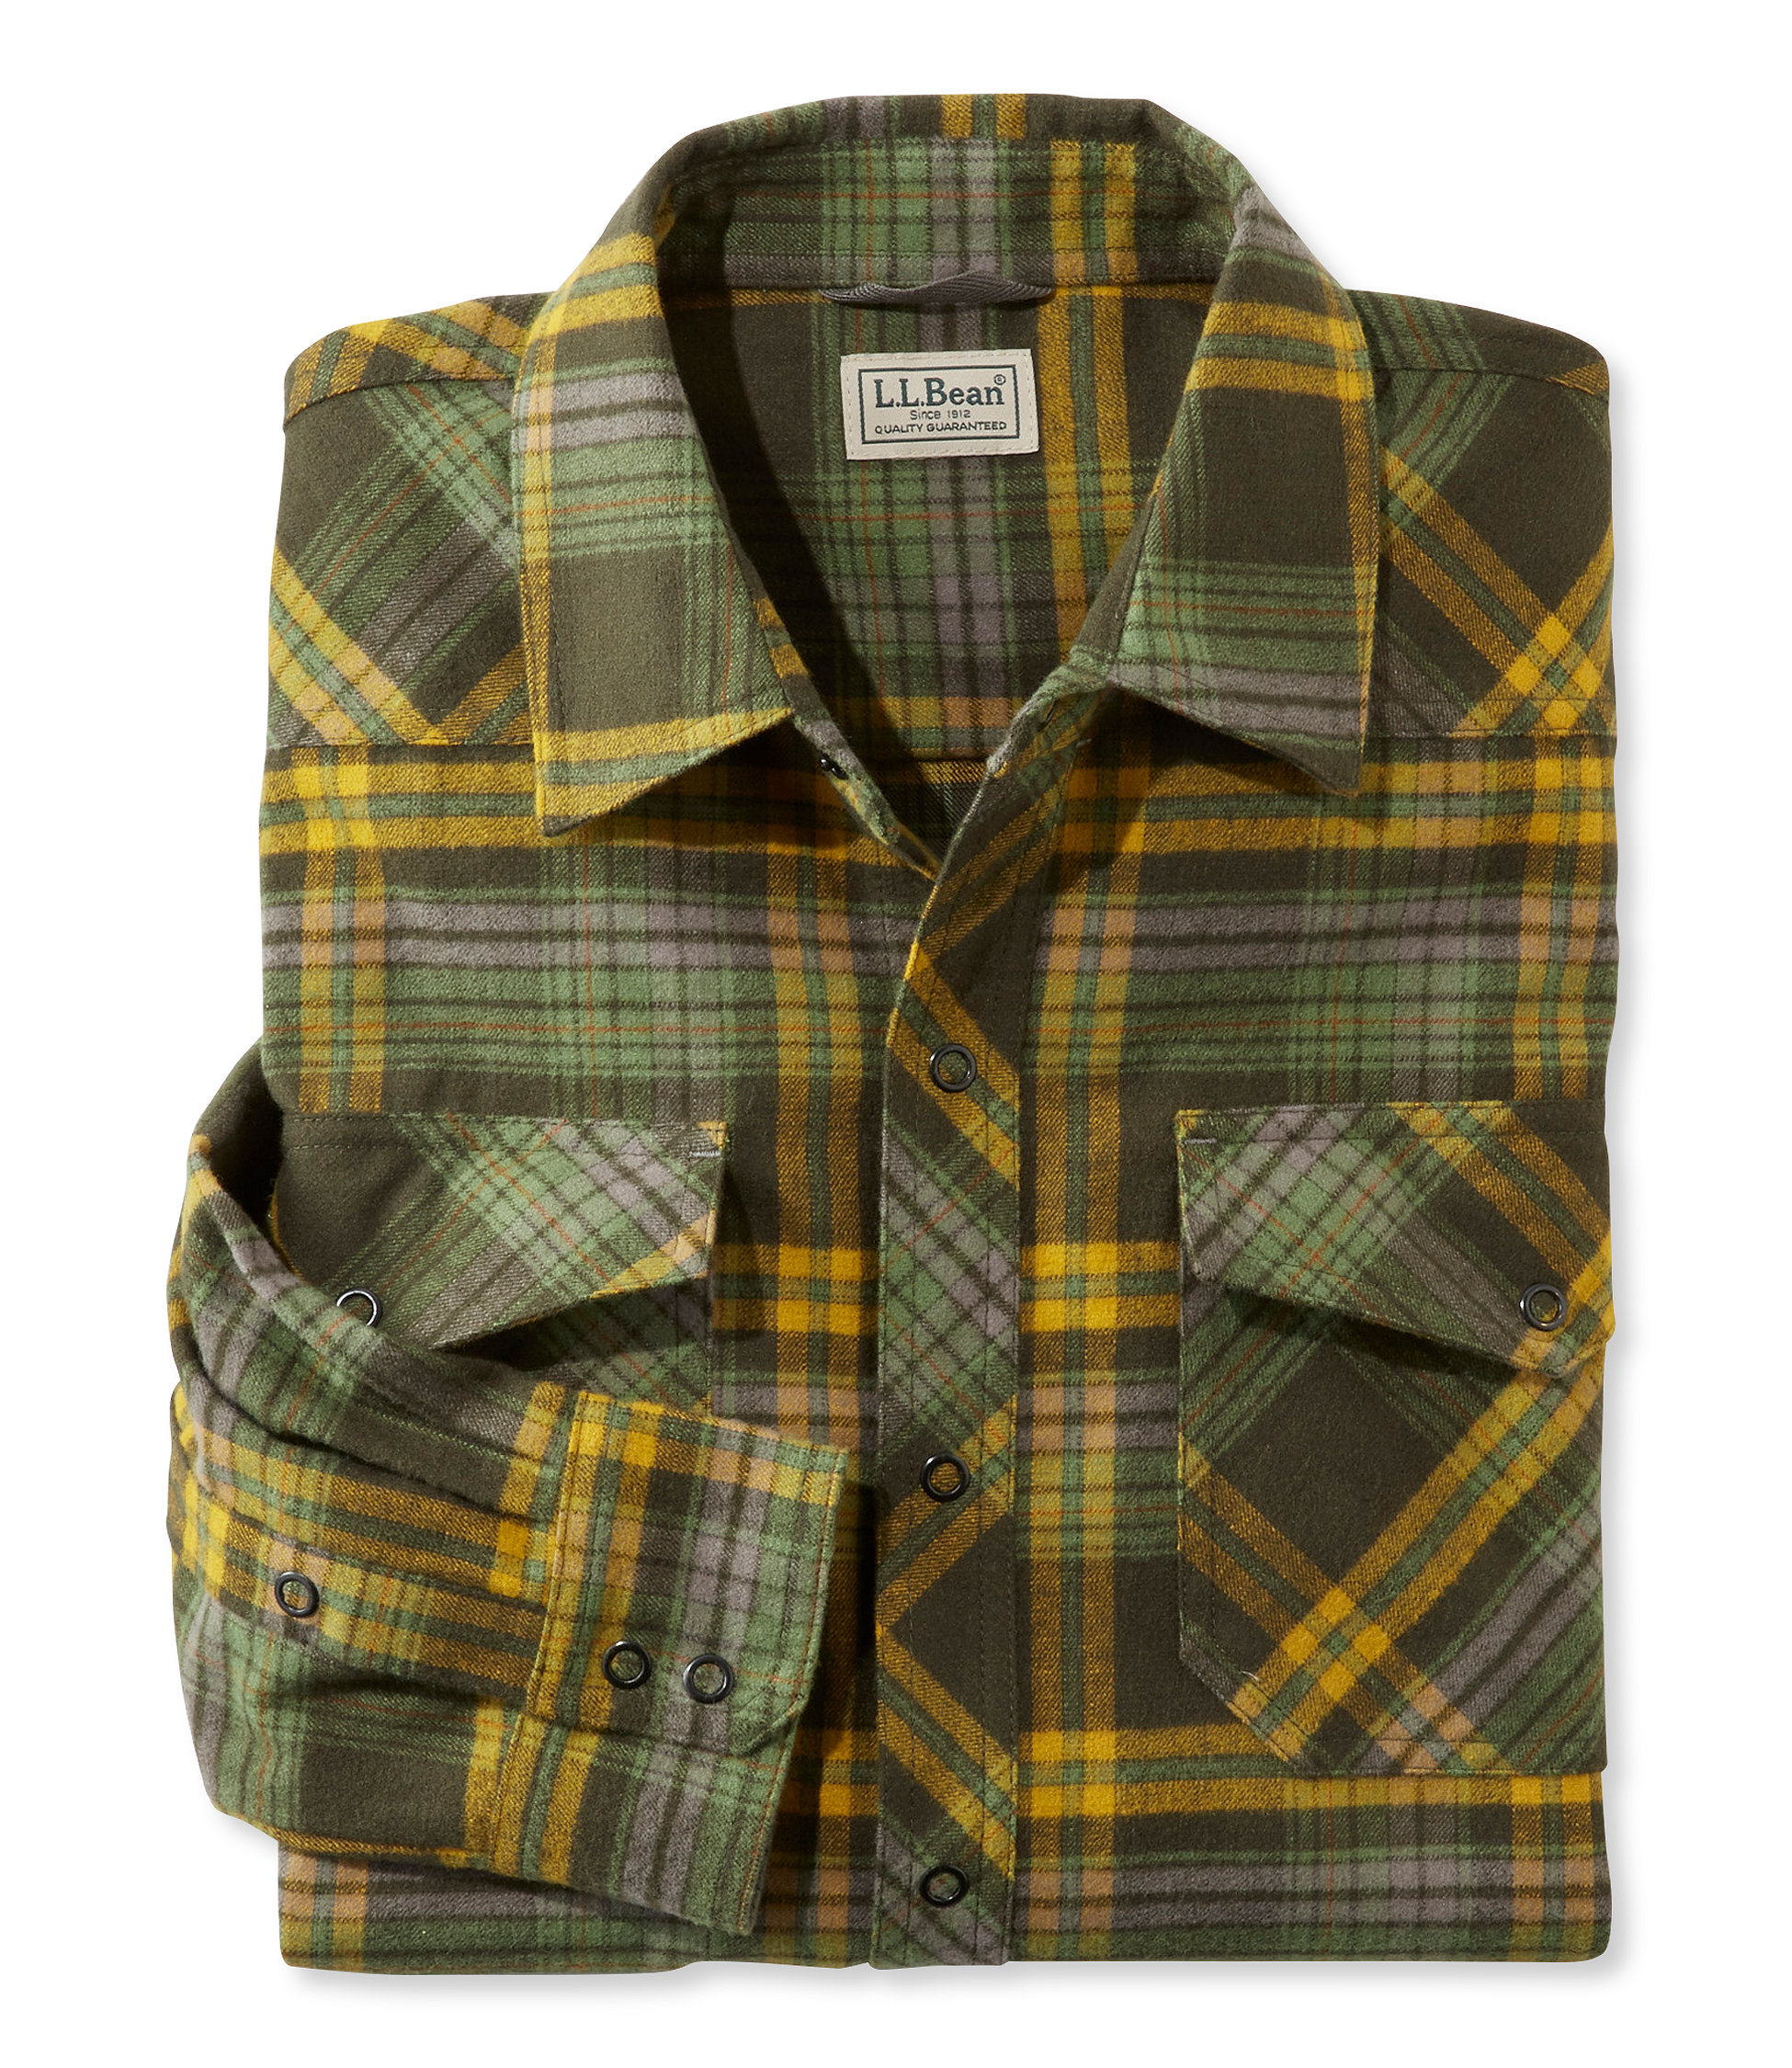 L.L.Bean Overland Performance Flannel Shirt